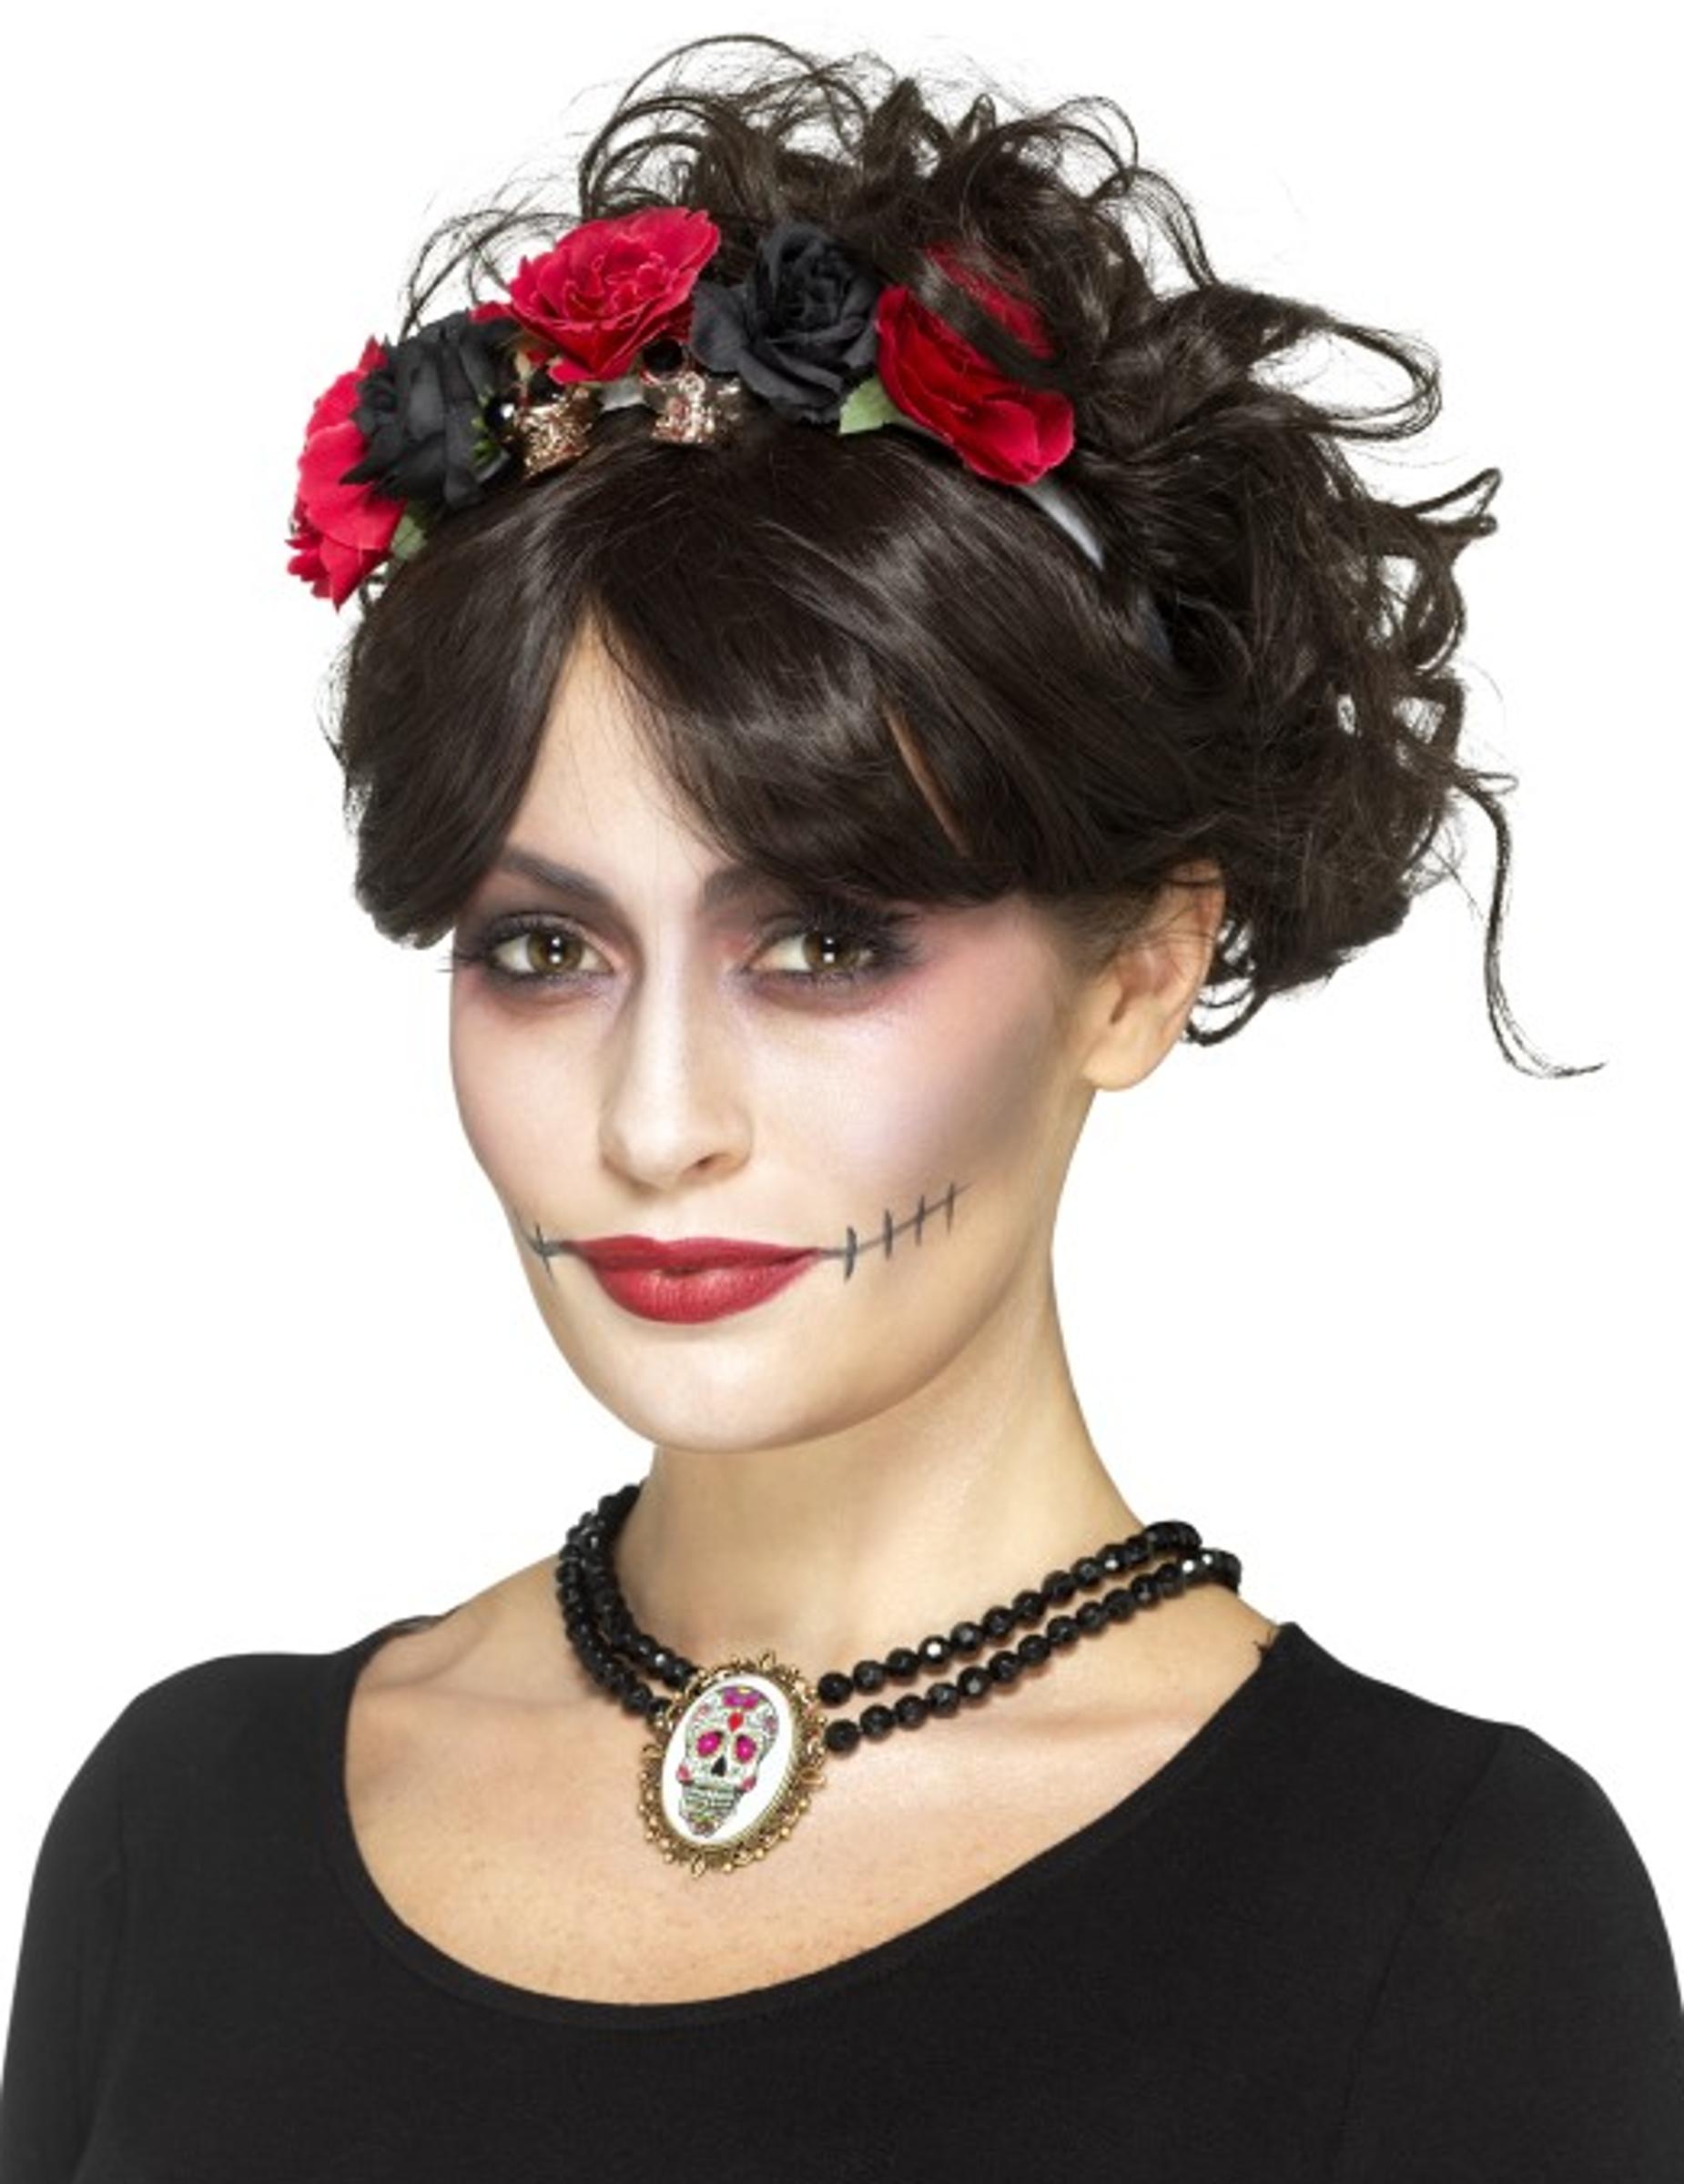 gothic halsband dia de los muertos f r damen accessoires und g nstige faschingskost me vegaoo. Black Bedroom Furniture Sets. Home Design Ideas